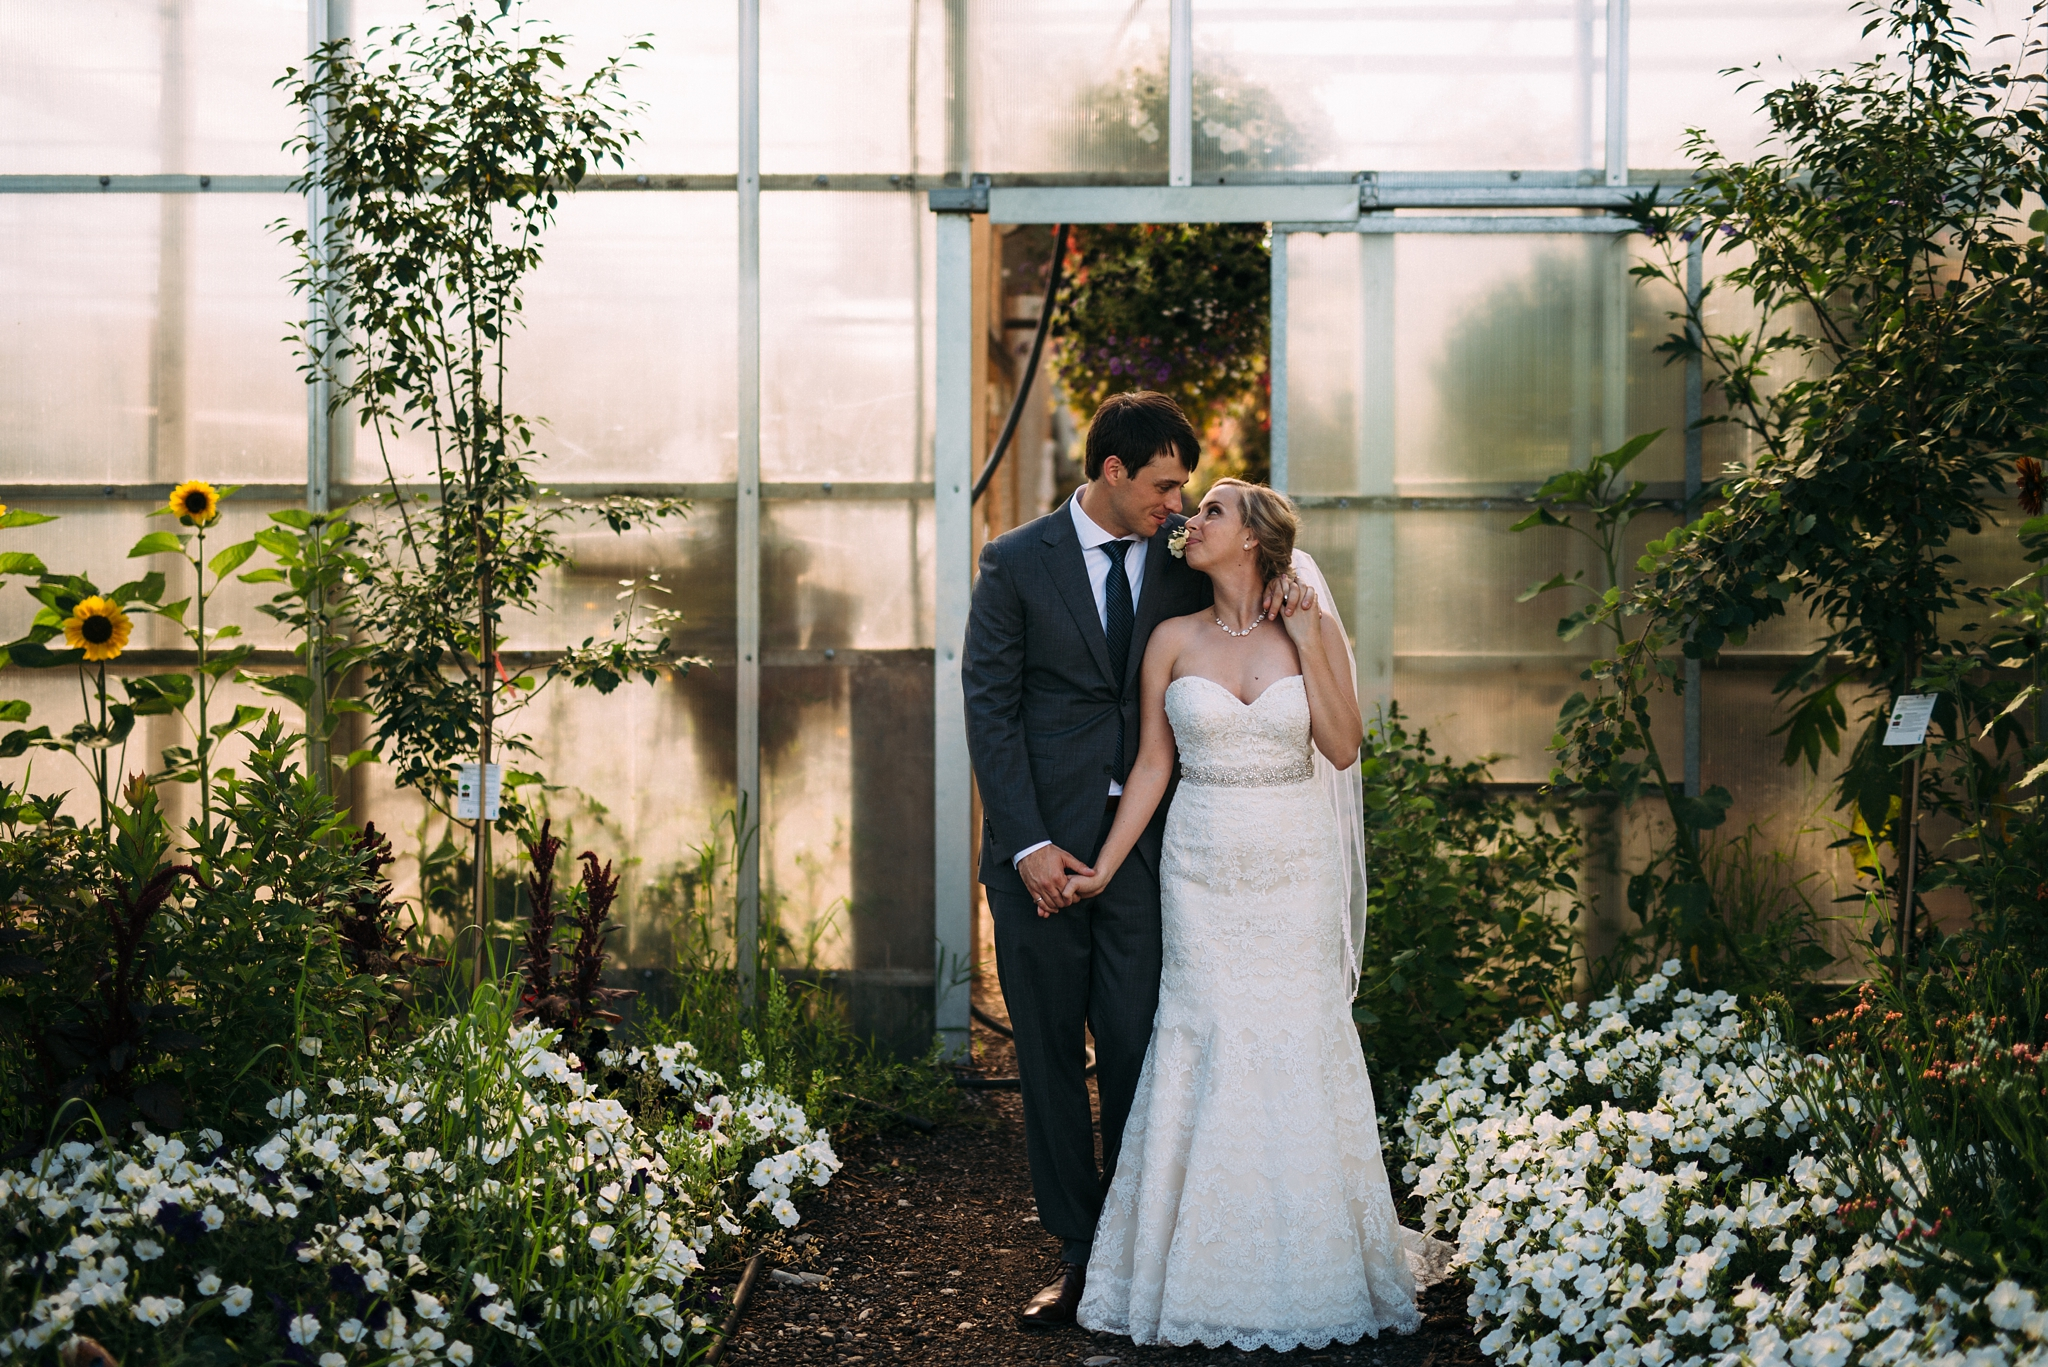 kaihla_tonai_intimate_wedding_elopement_photographer_4333